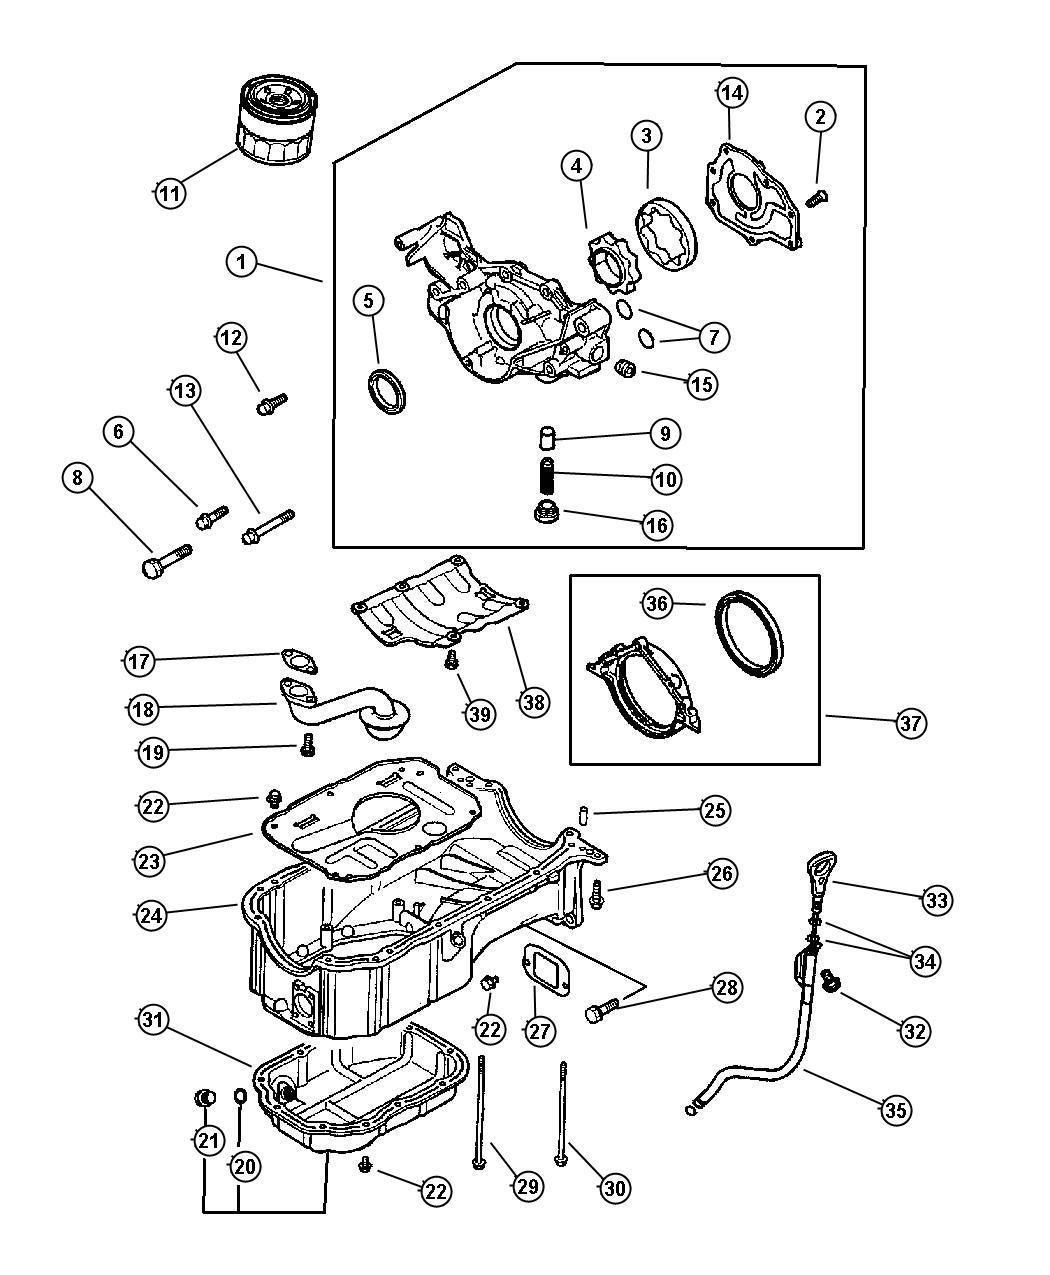 2001 3 0l Sebring Enginepartment Diagram